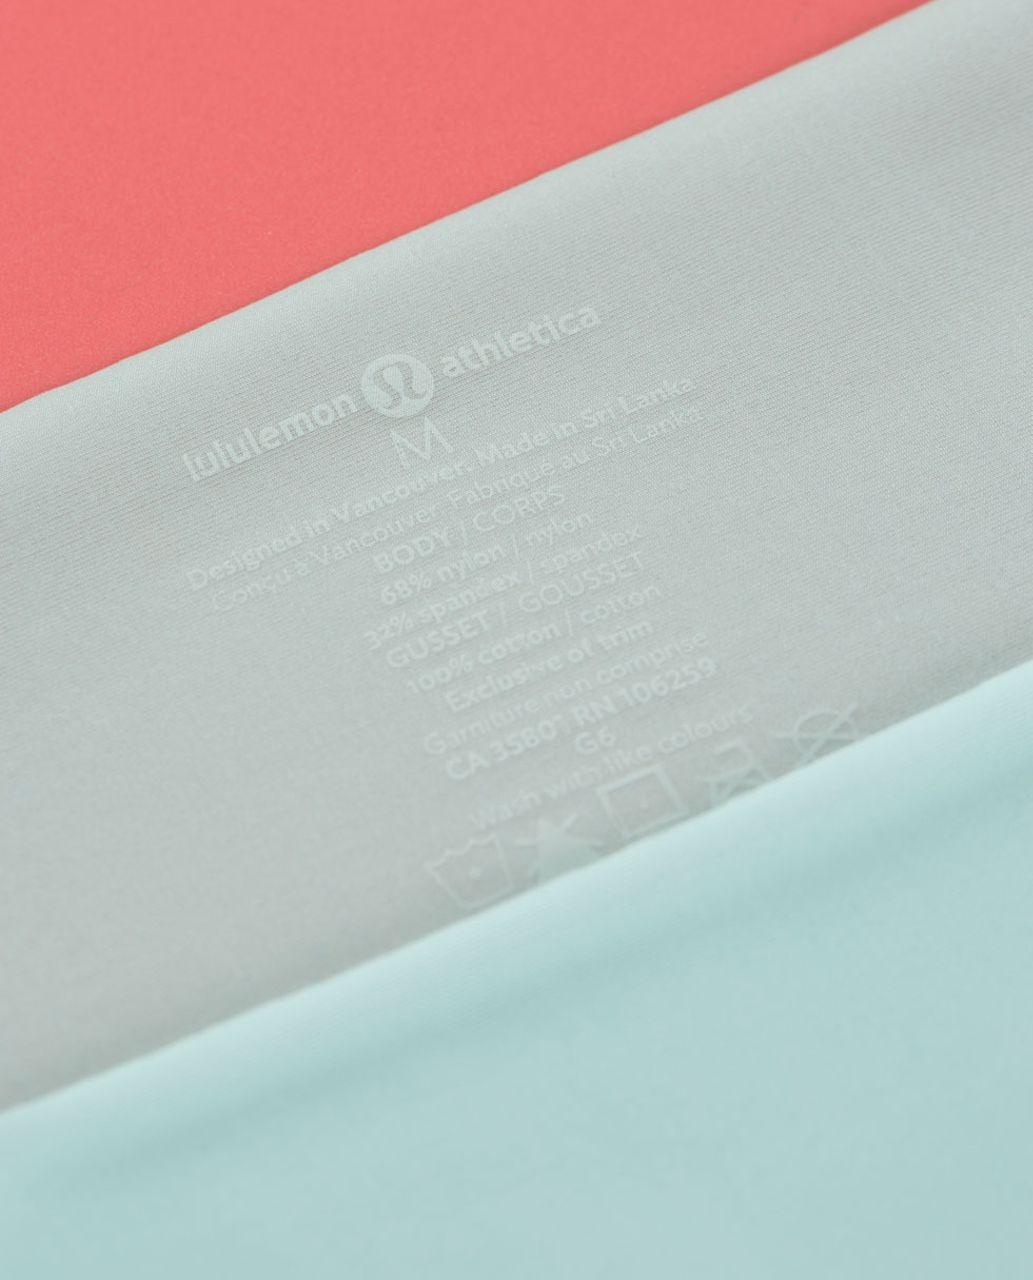 Lululemon Light As Air Thong - Aquamarine